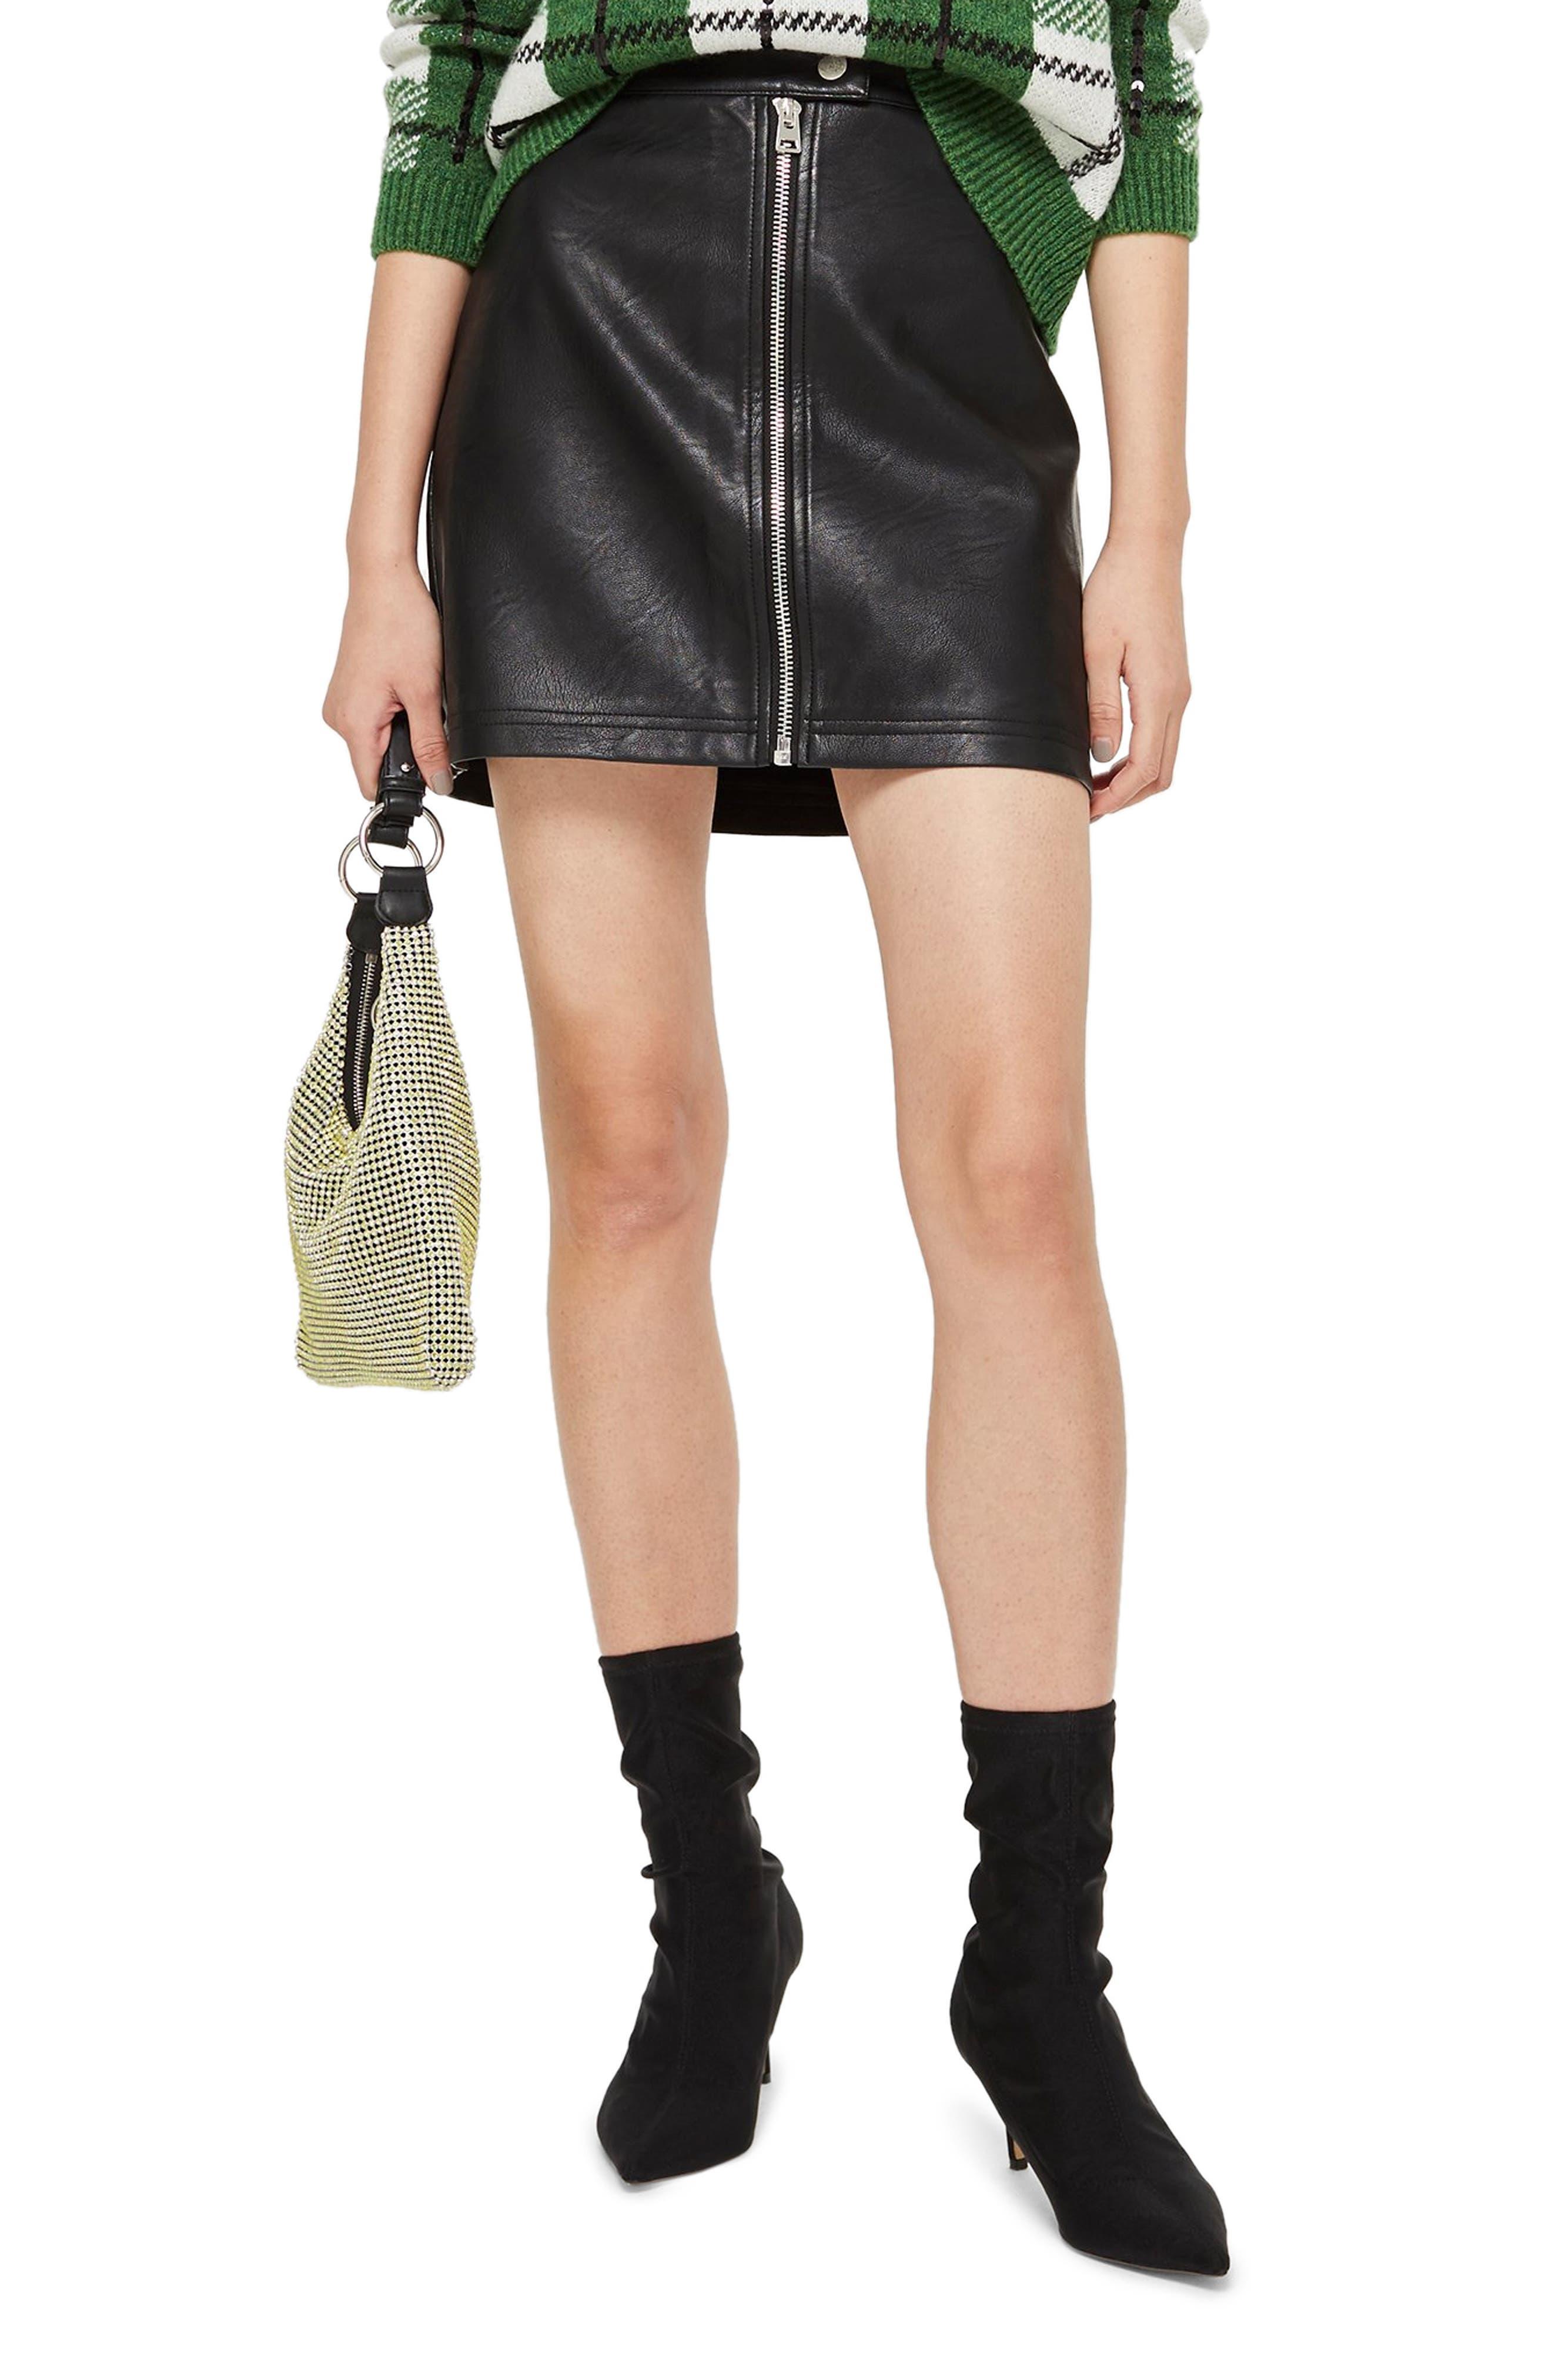 Topshop Penelope Faux Leather Miniskirt, US (fits like 10-12) - Black